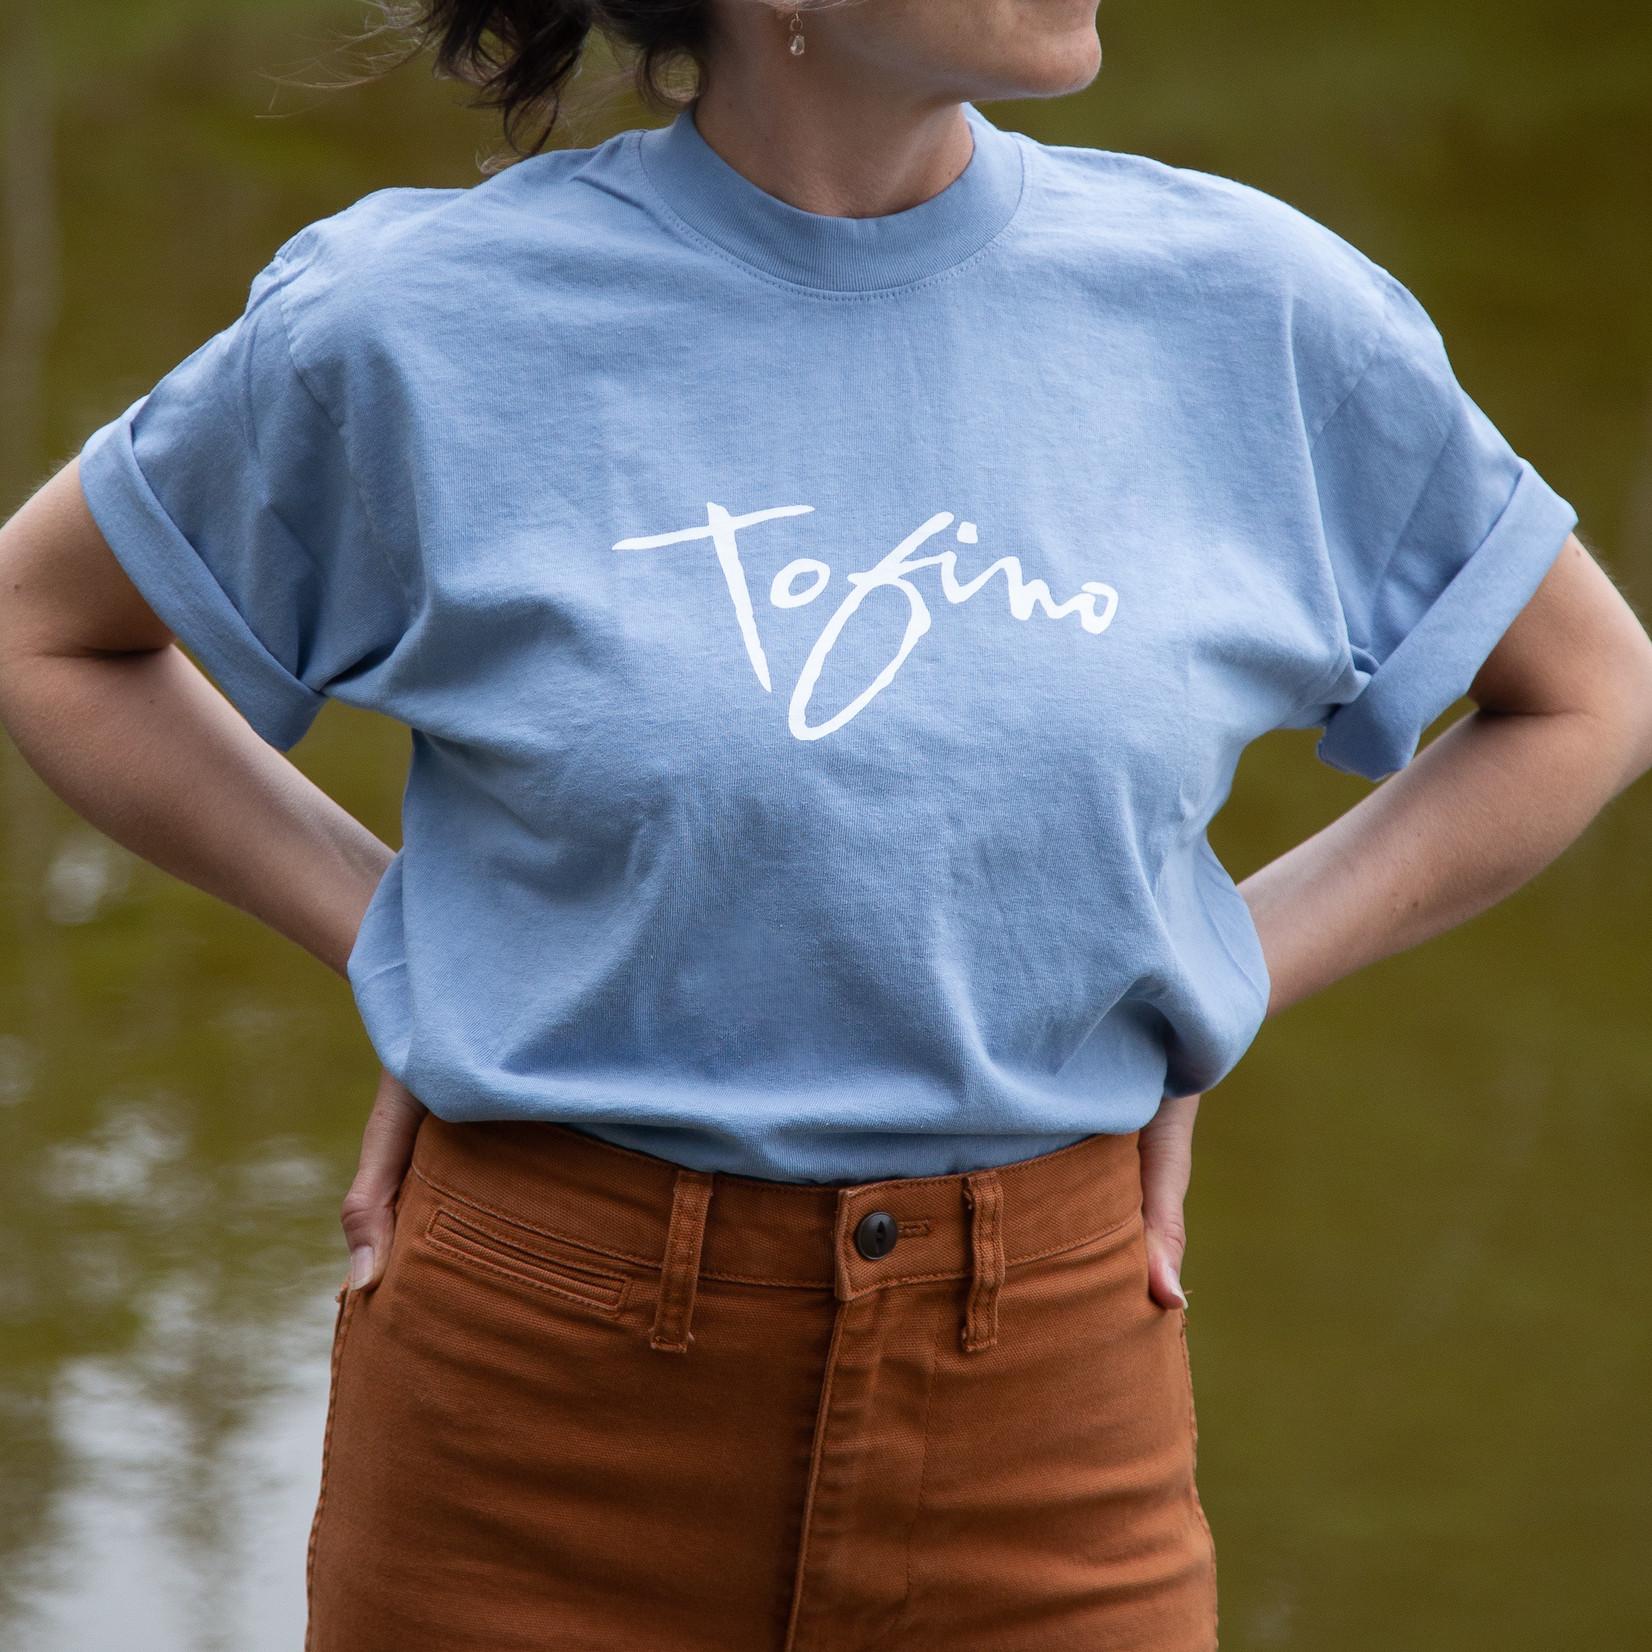 Tourism Tofino Unisex T-Shirt